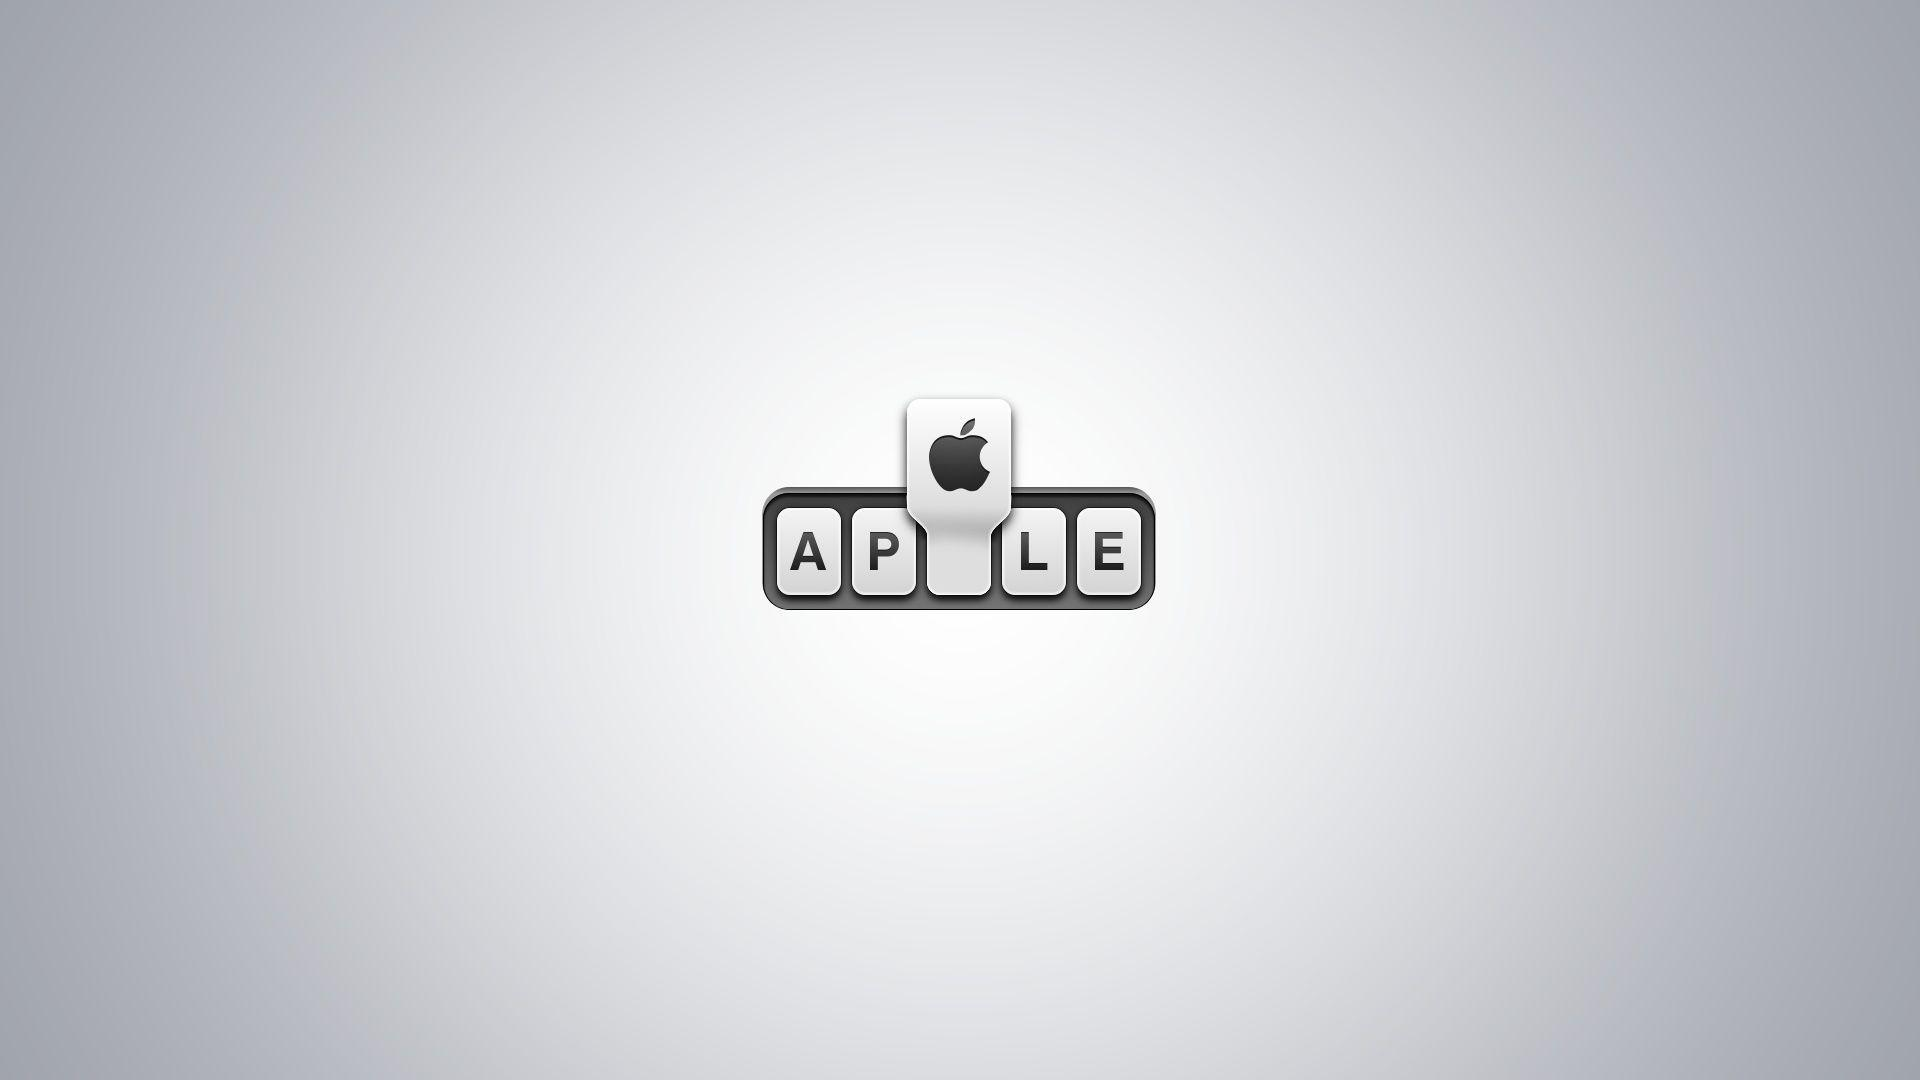 HD Apple wallpaper  Desktop Wallpapers System wallpaper